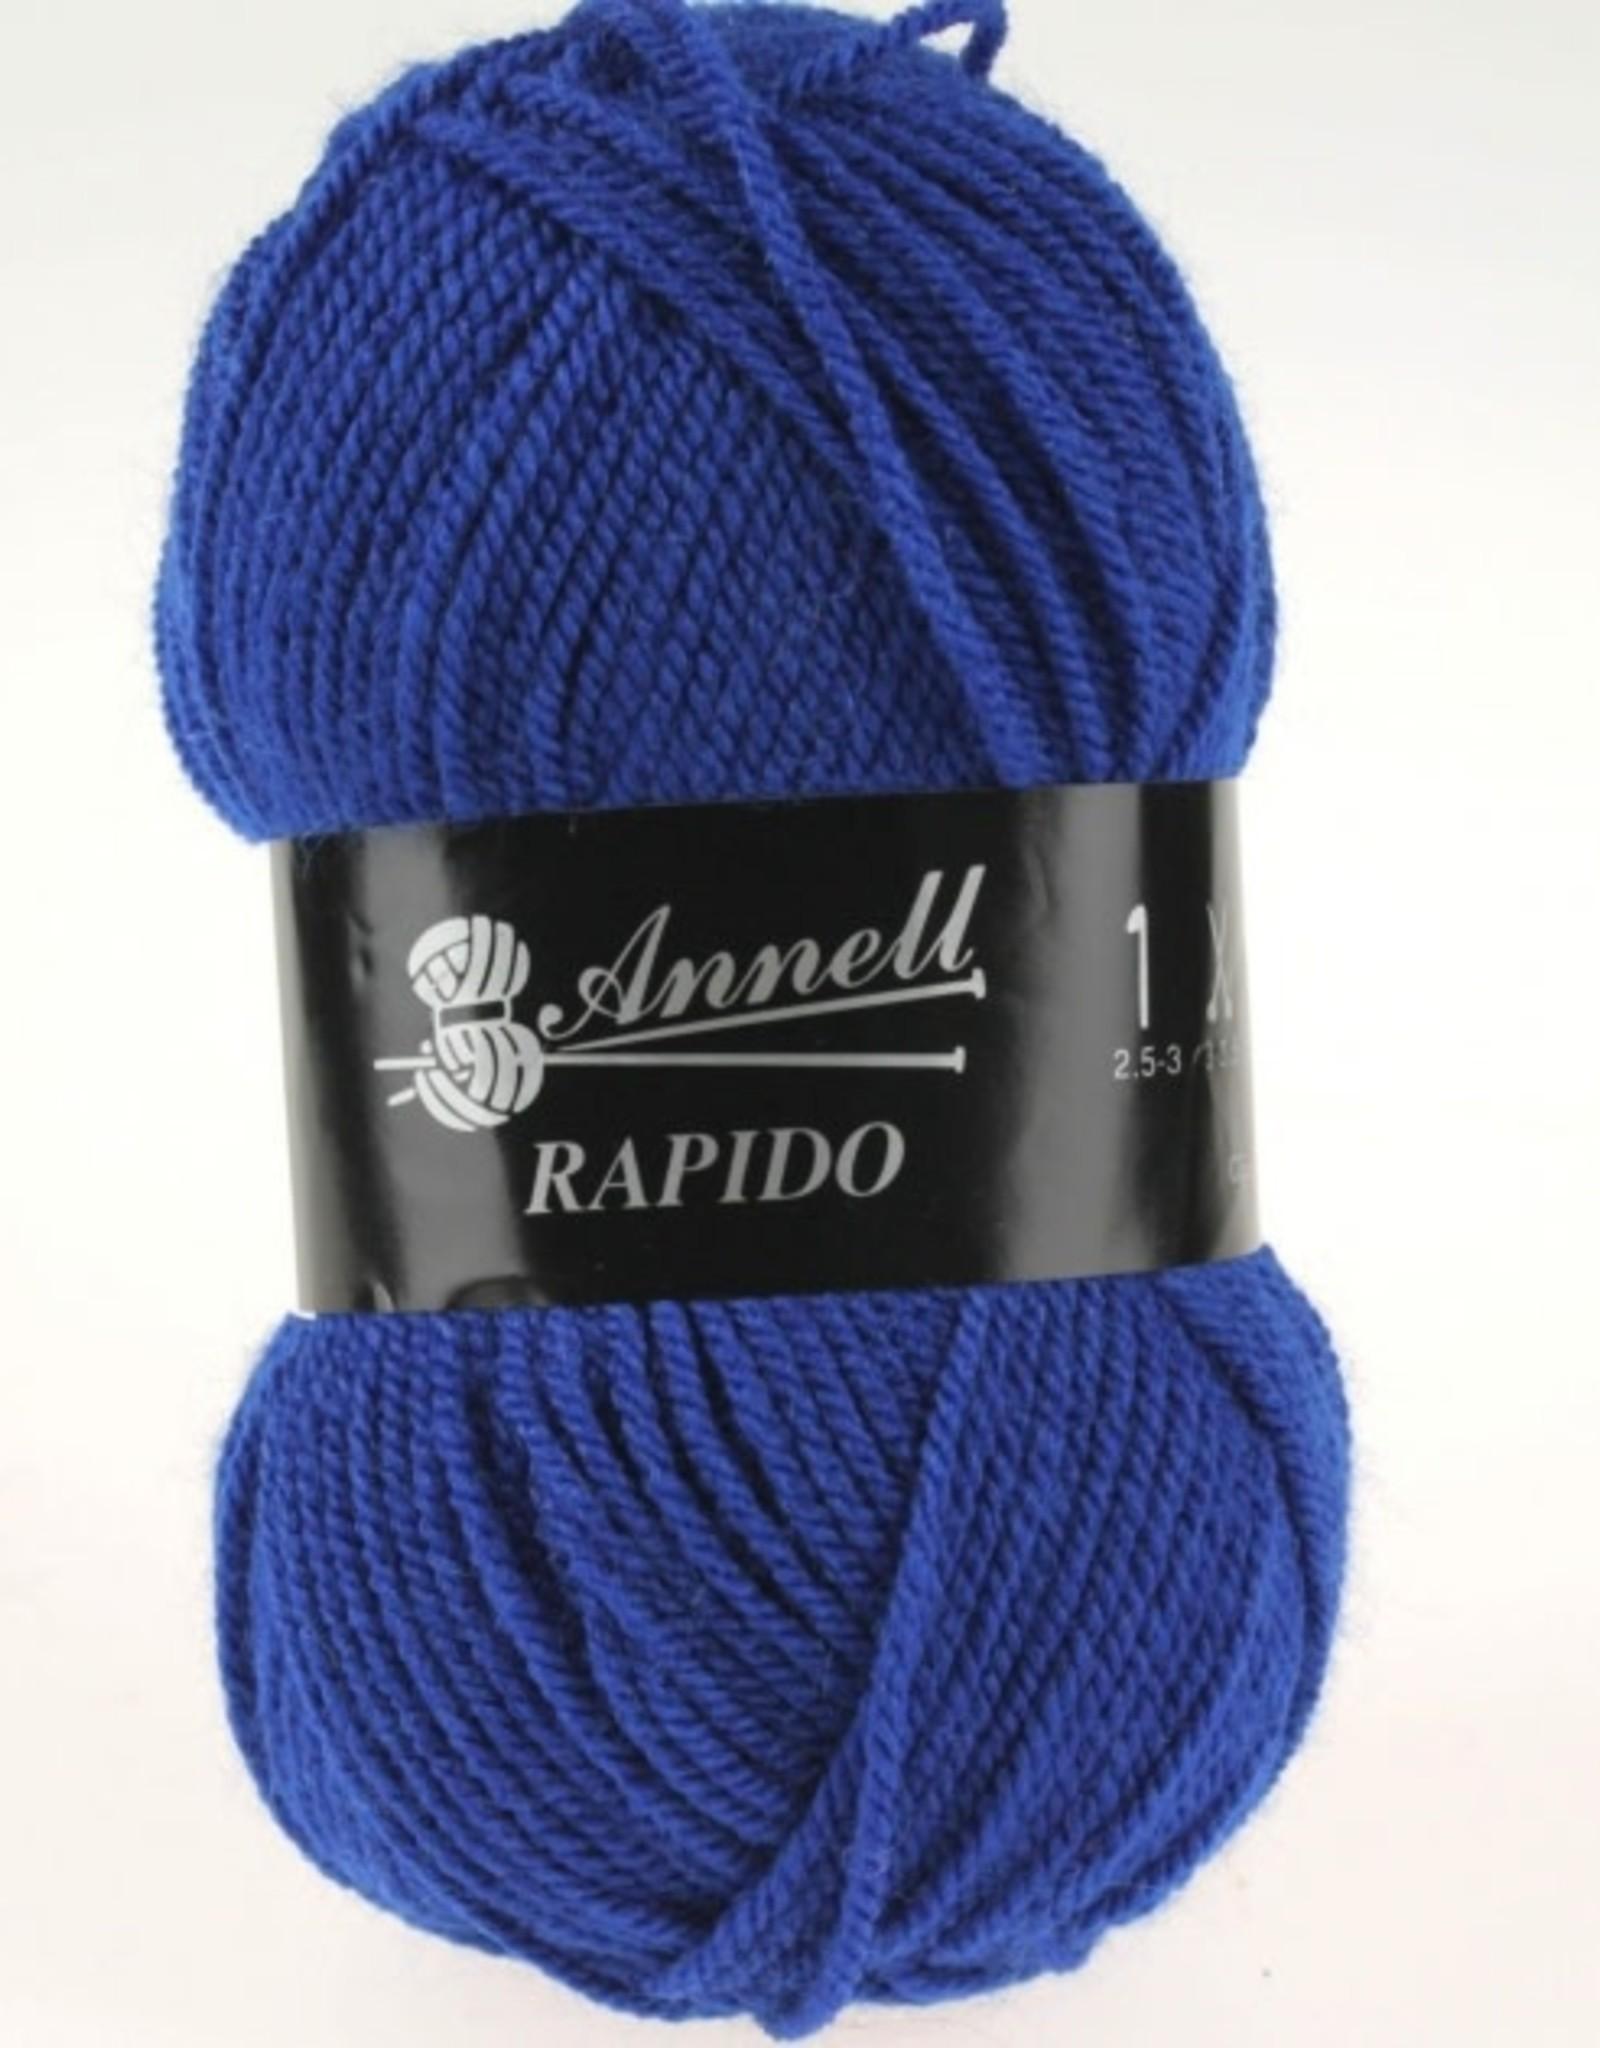 Annell Annell rapido 3238